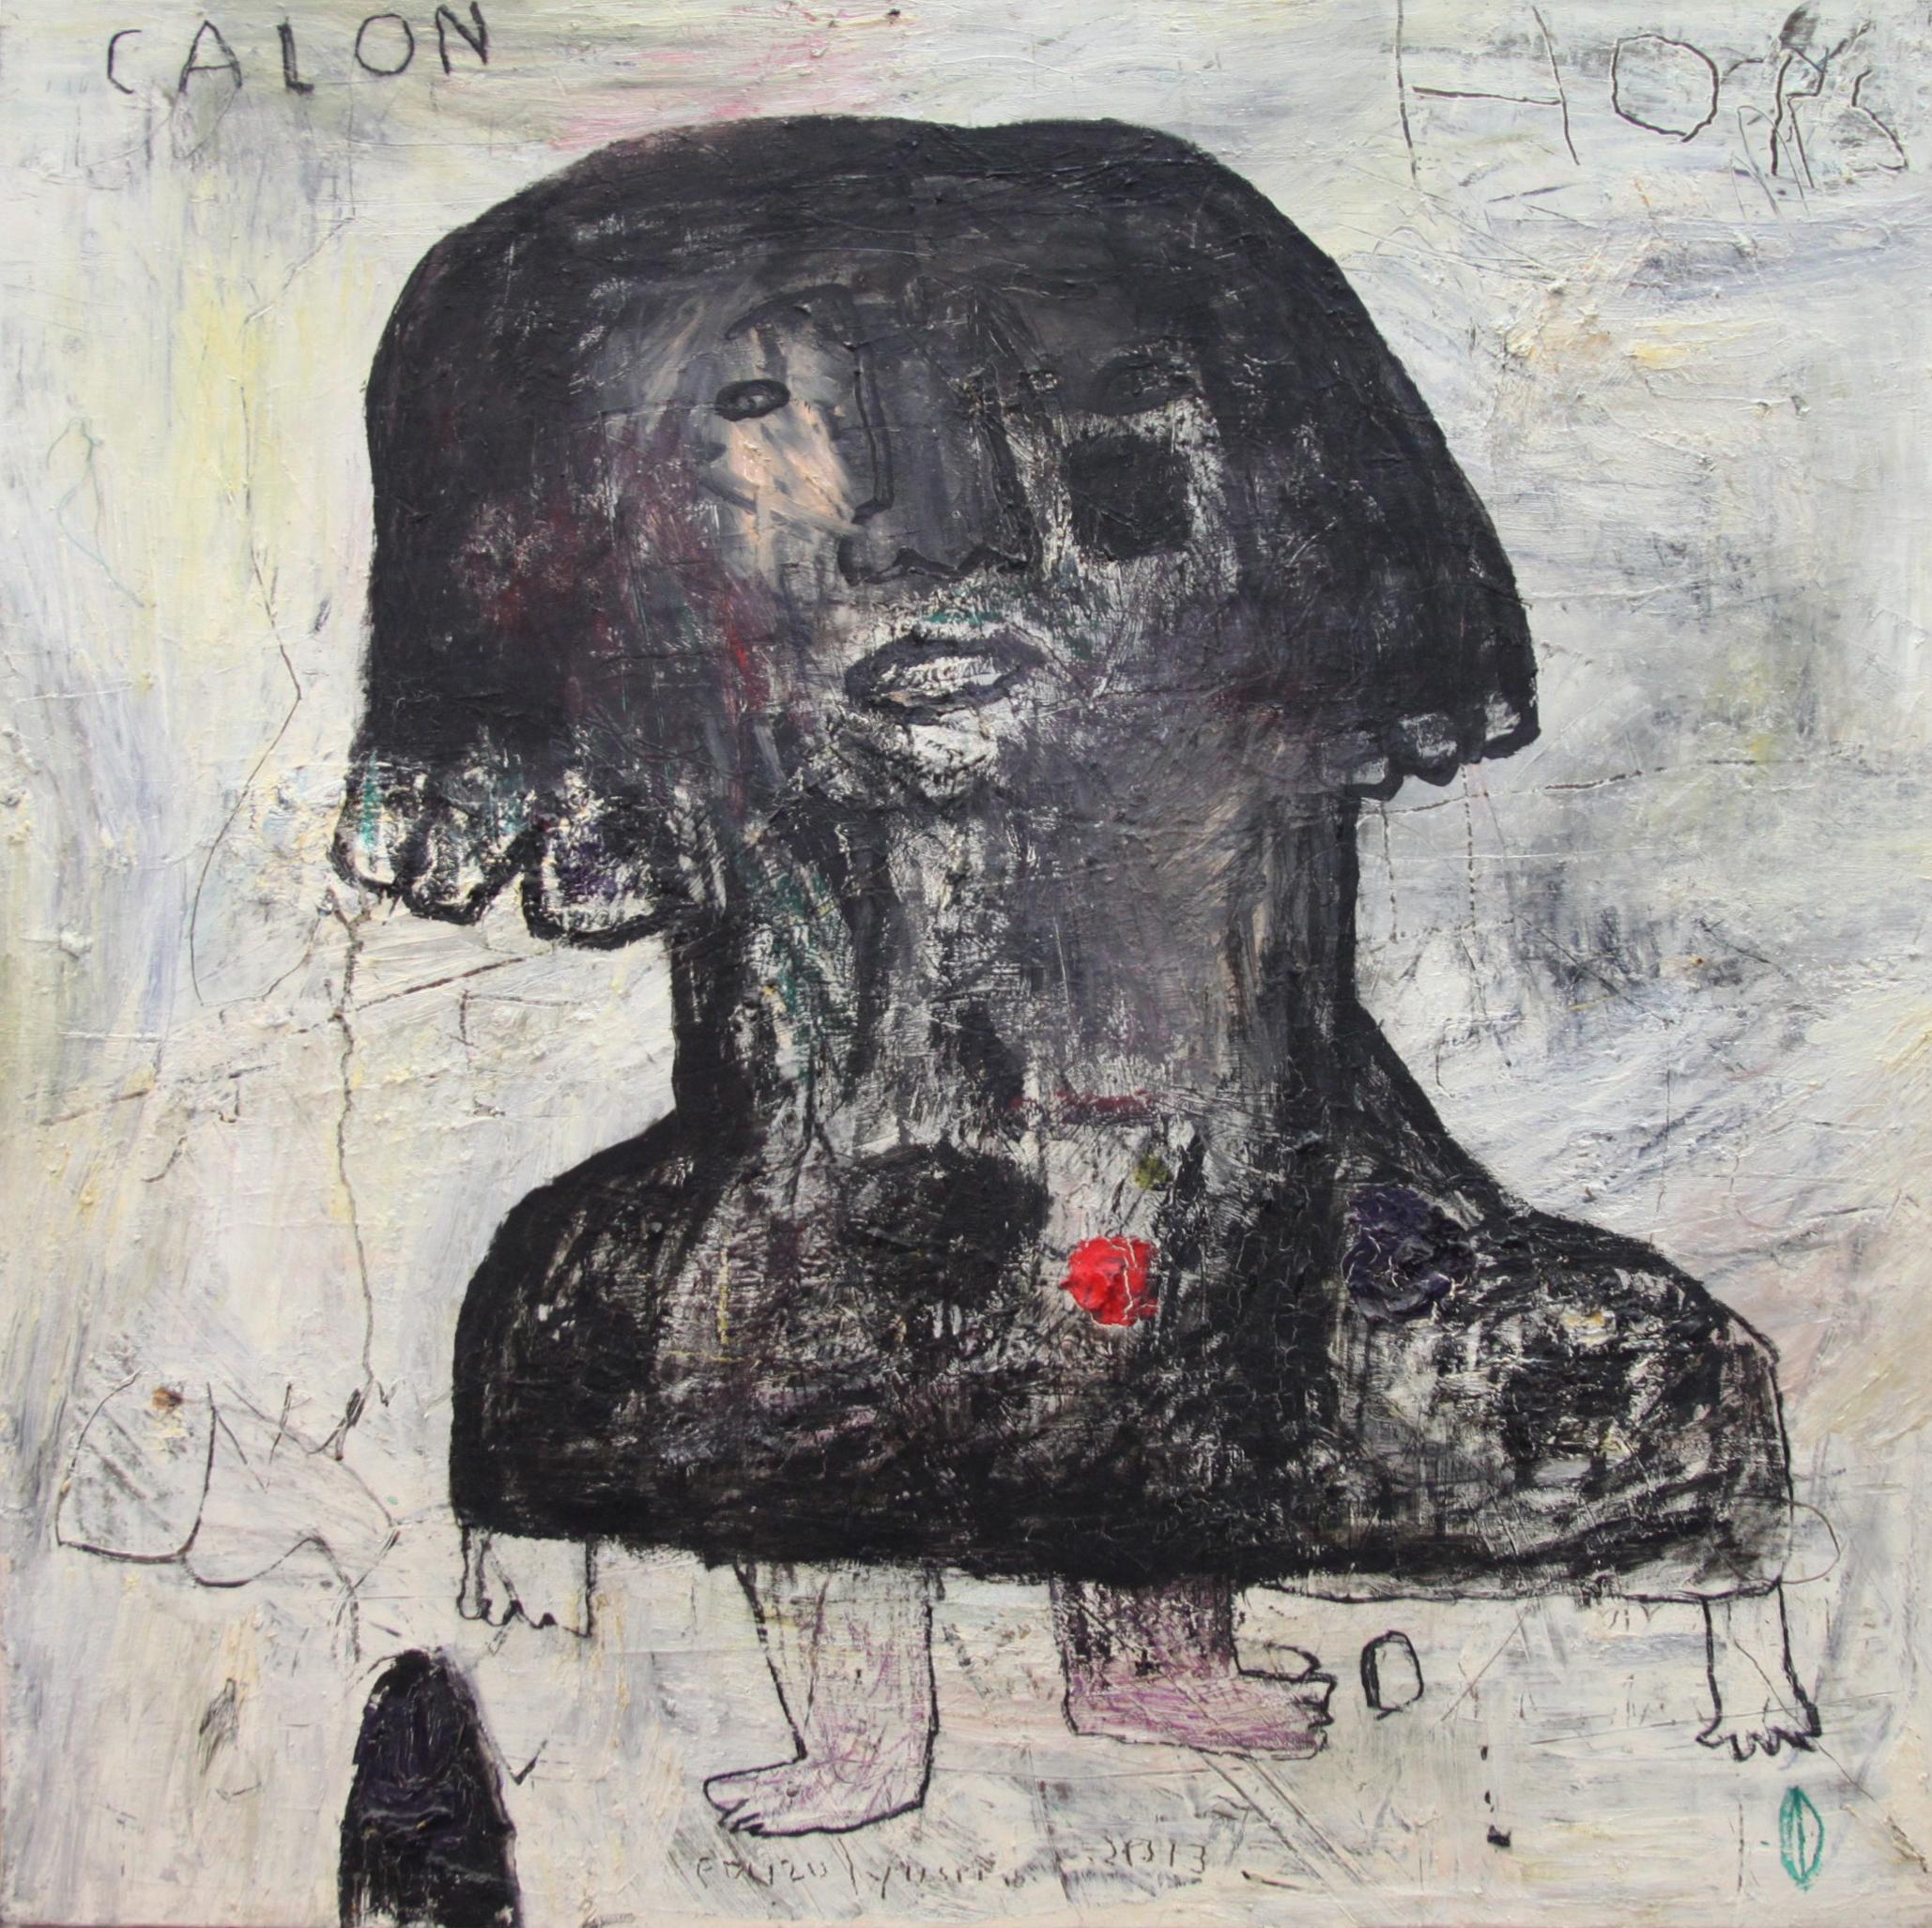 Calon,Coreng Series